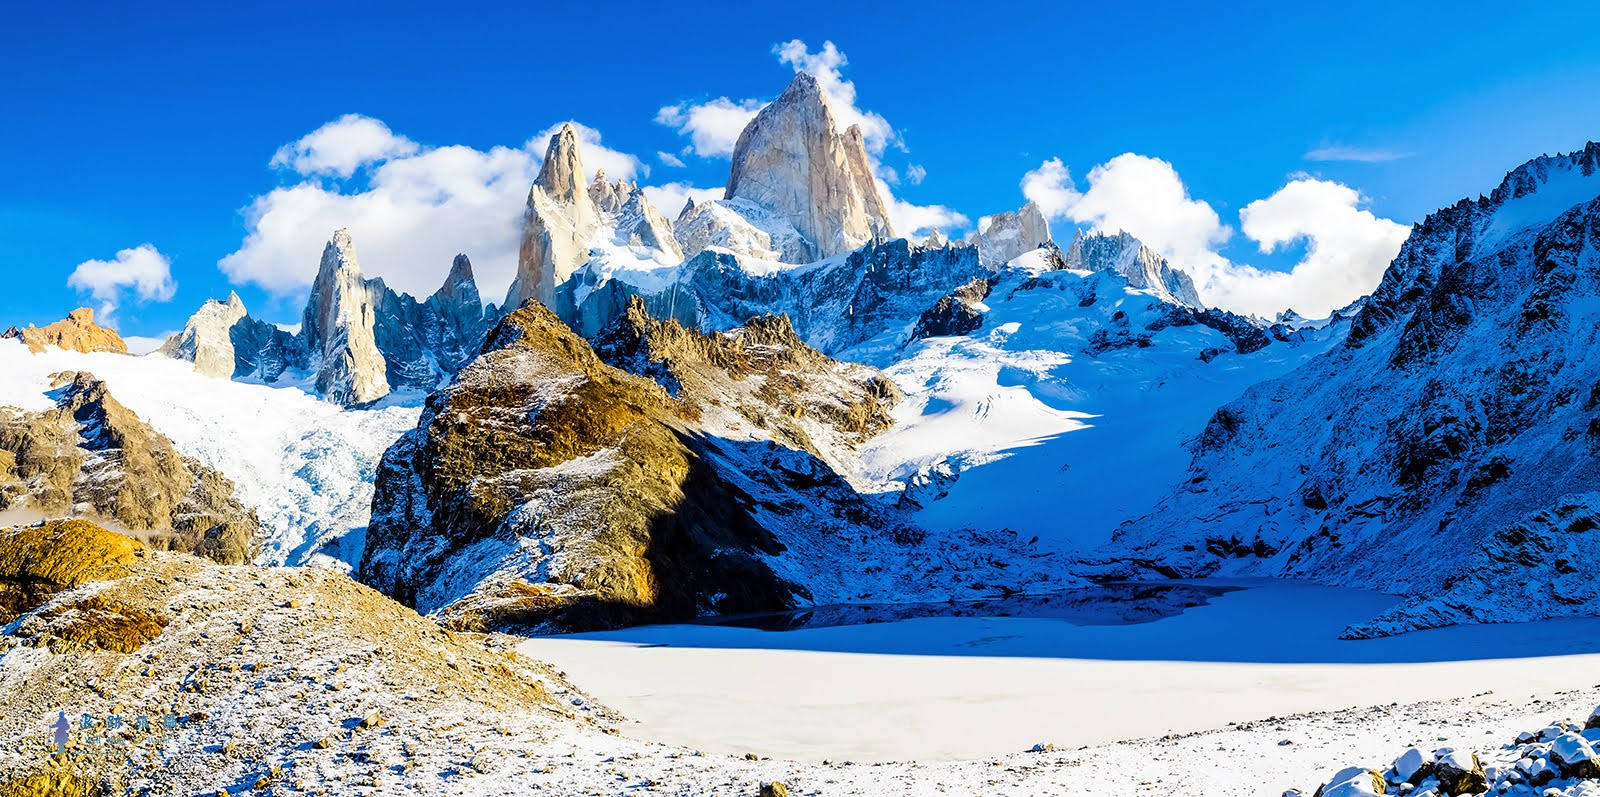 巴塔哥尼亞 Patagonia El Chalten Monte Fitz Roy 菲茨羅伊 阿根廷 Argentine